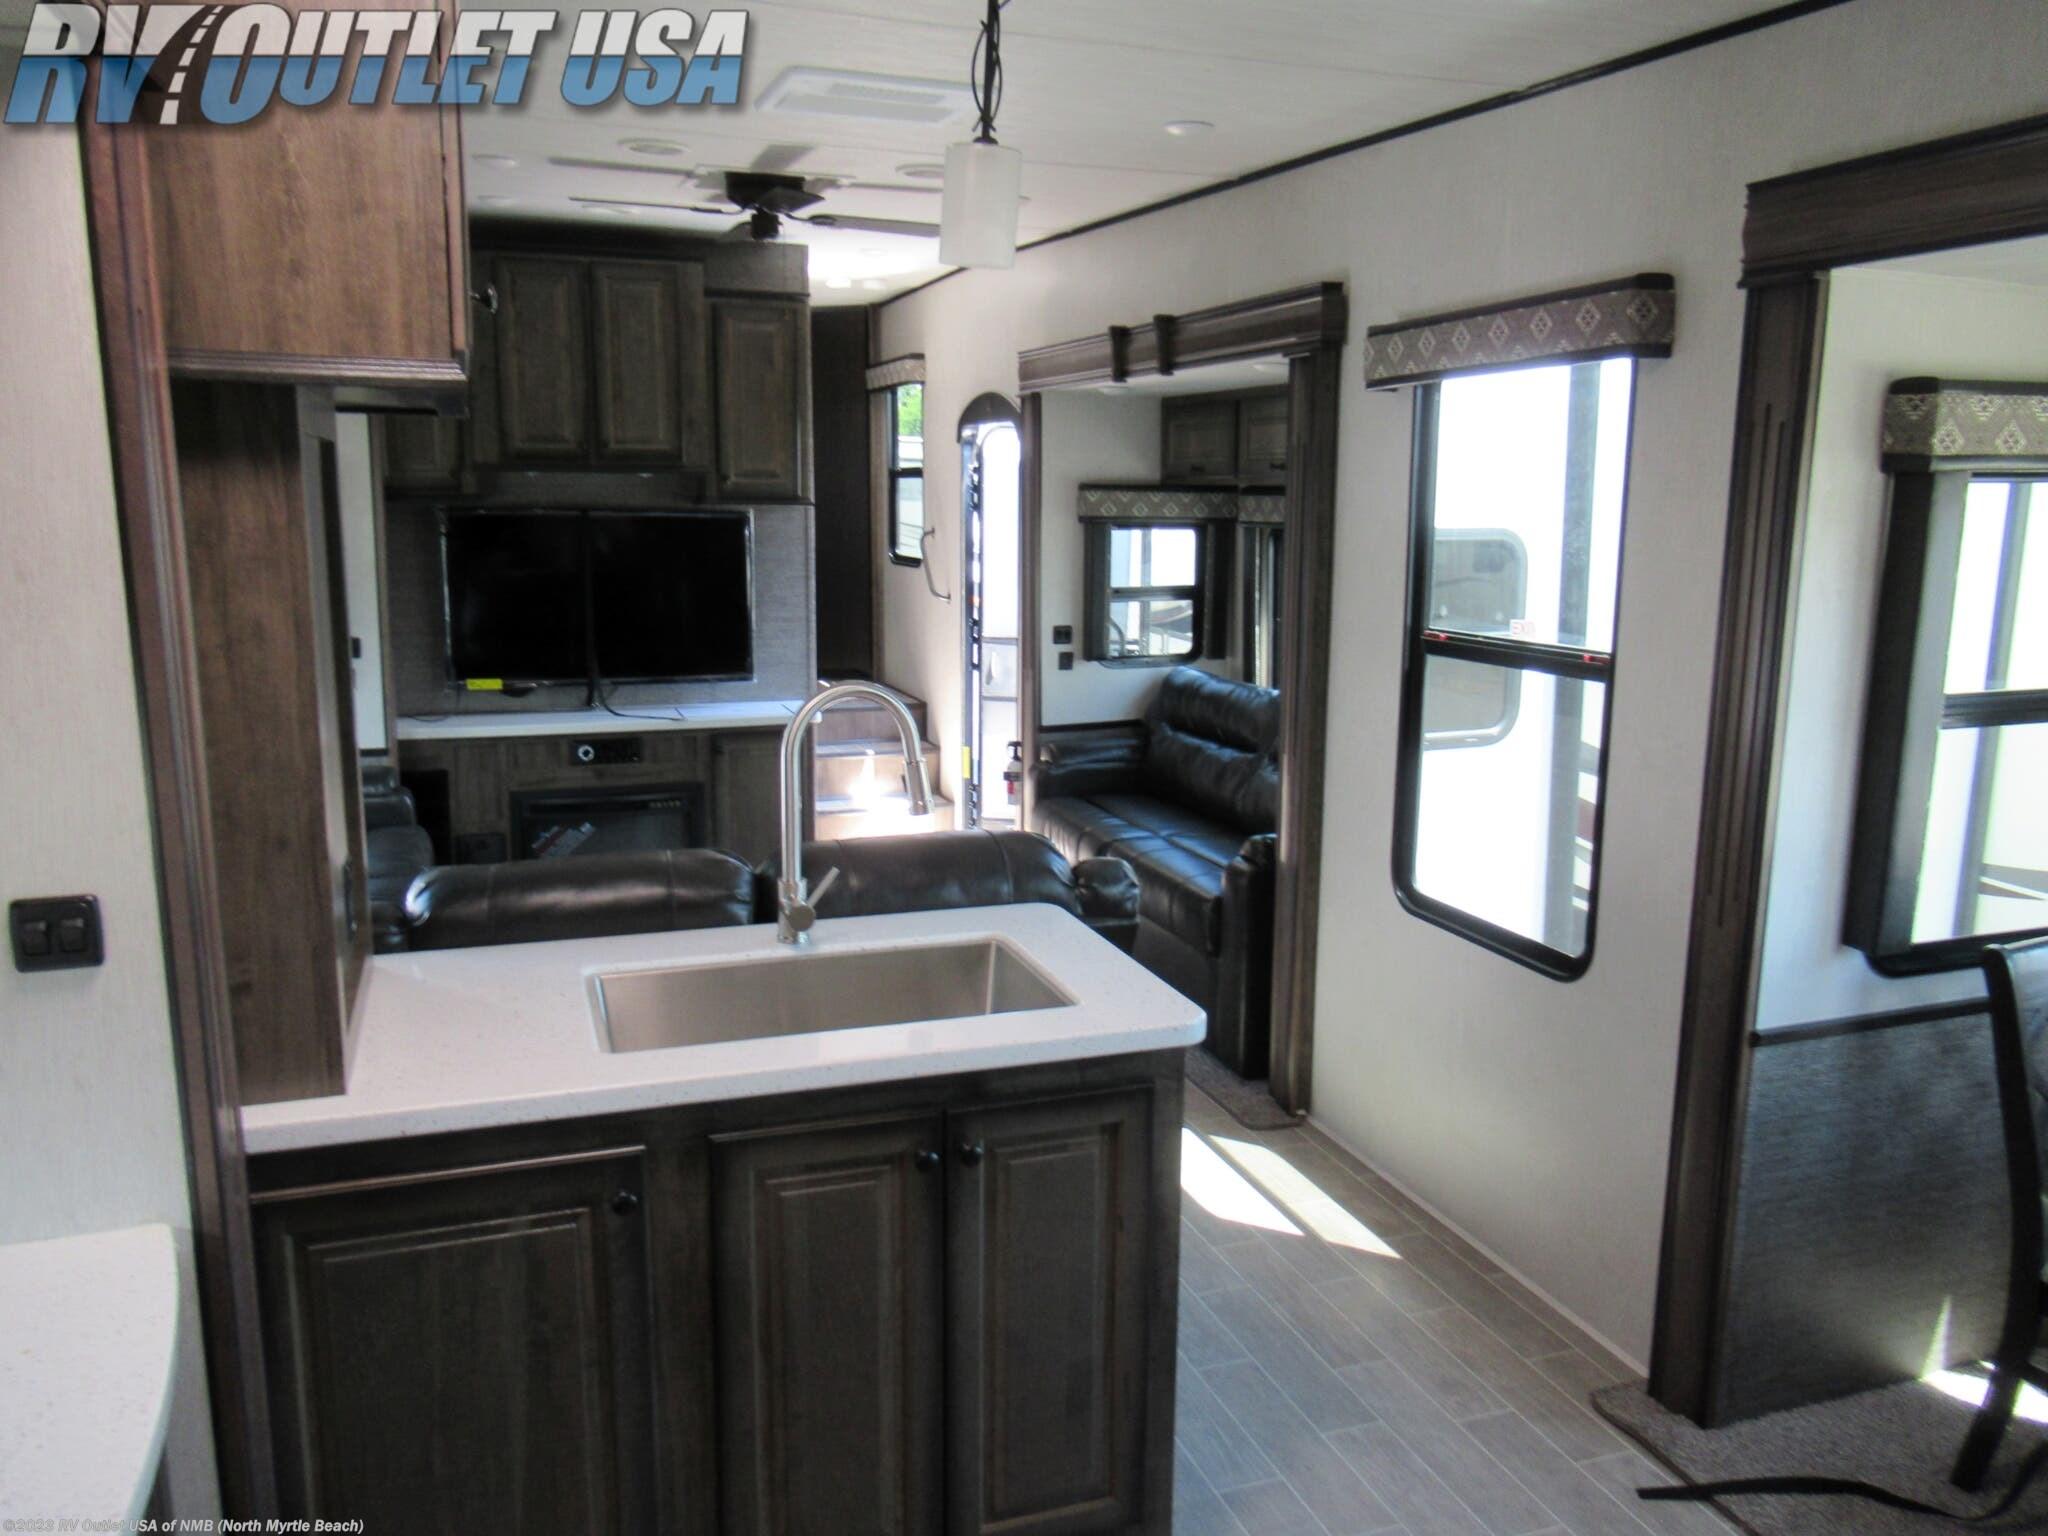 2020 Heartland Bighorn Traveler 39rk Rv For Sale In Longs